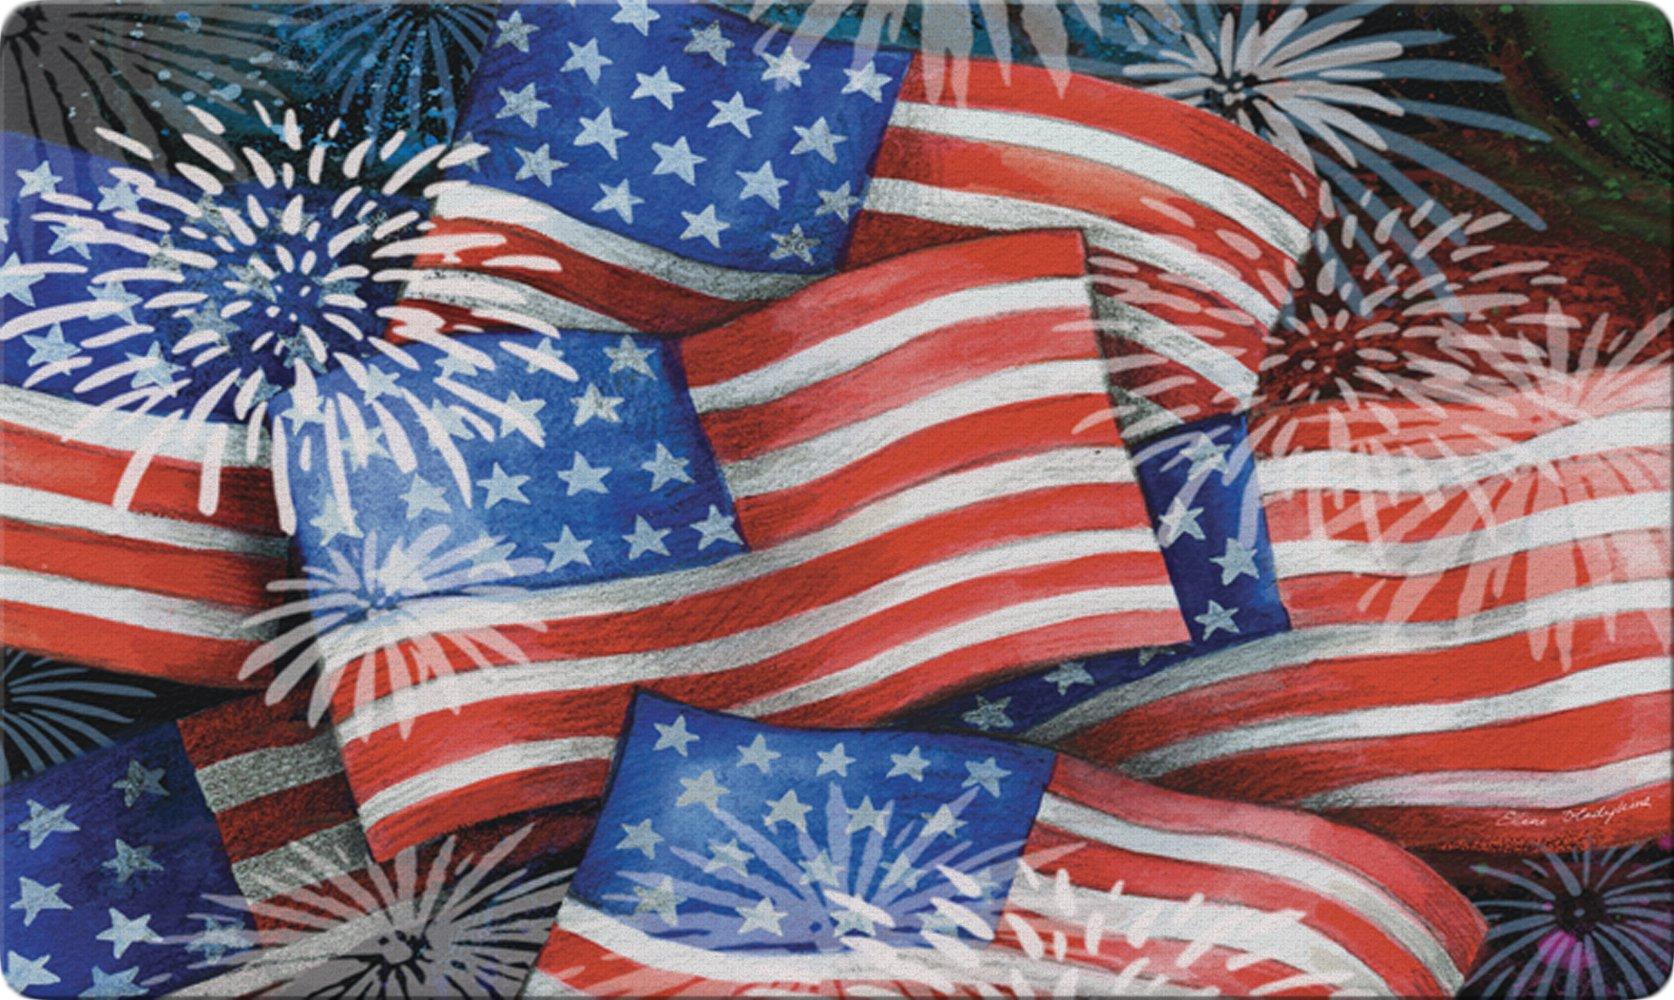 Toland Home Garden Sparkling Old Glory 18 x 30 Inch Decorative Floor Mat Patriotic USA America Flag Collage Doormat